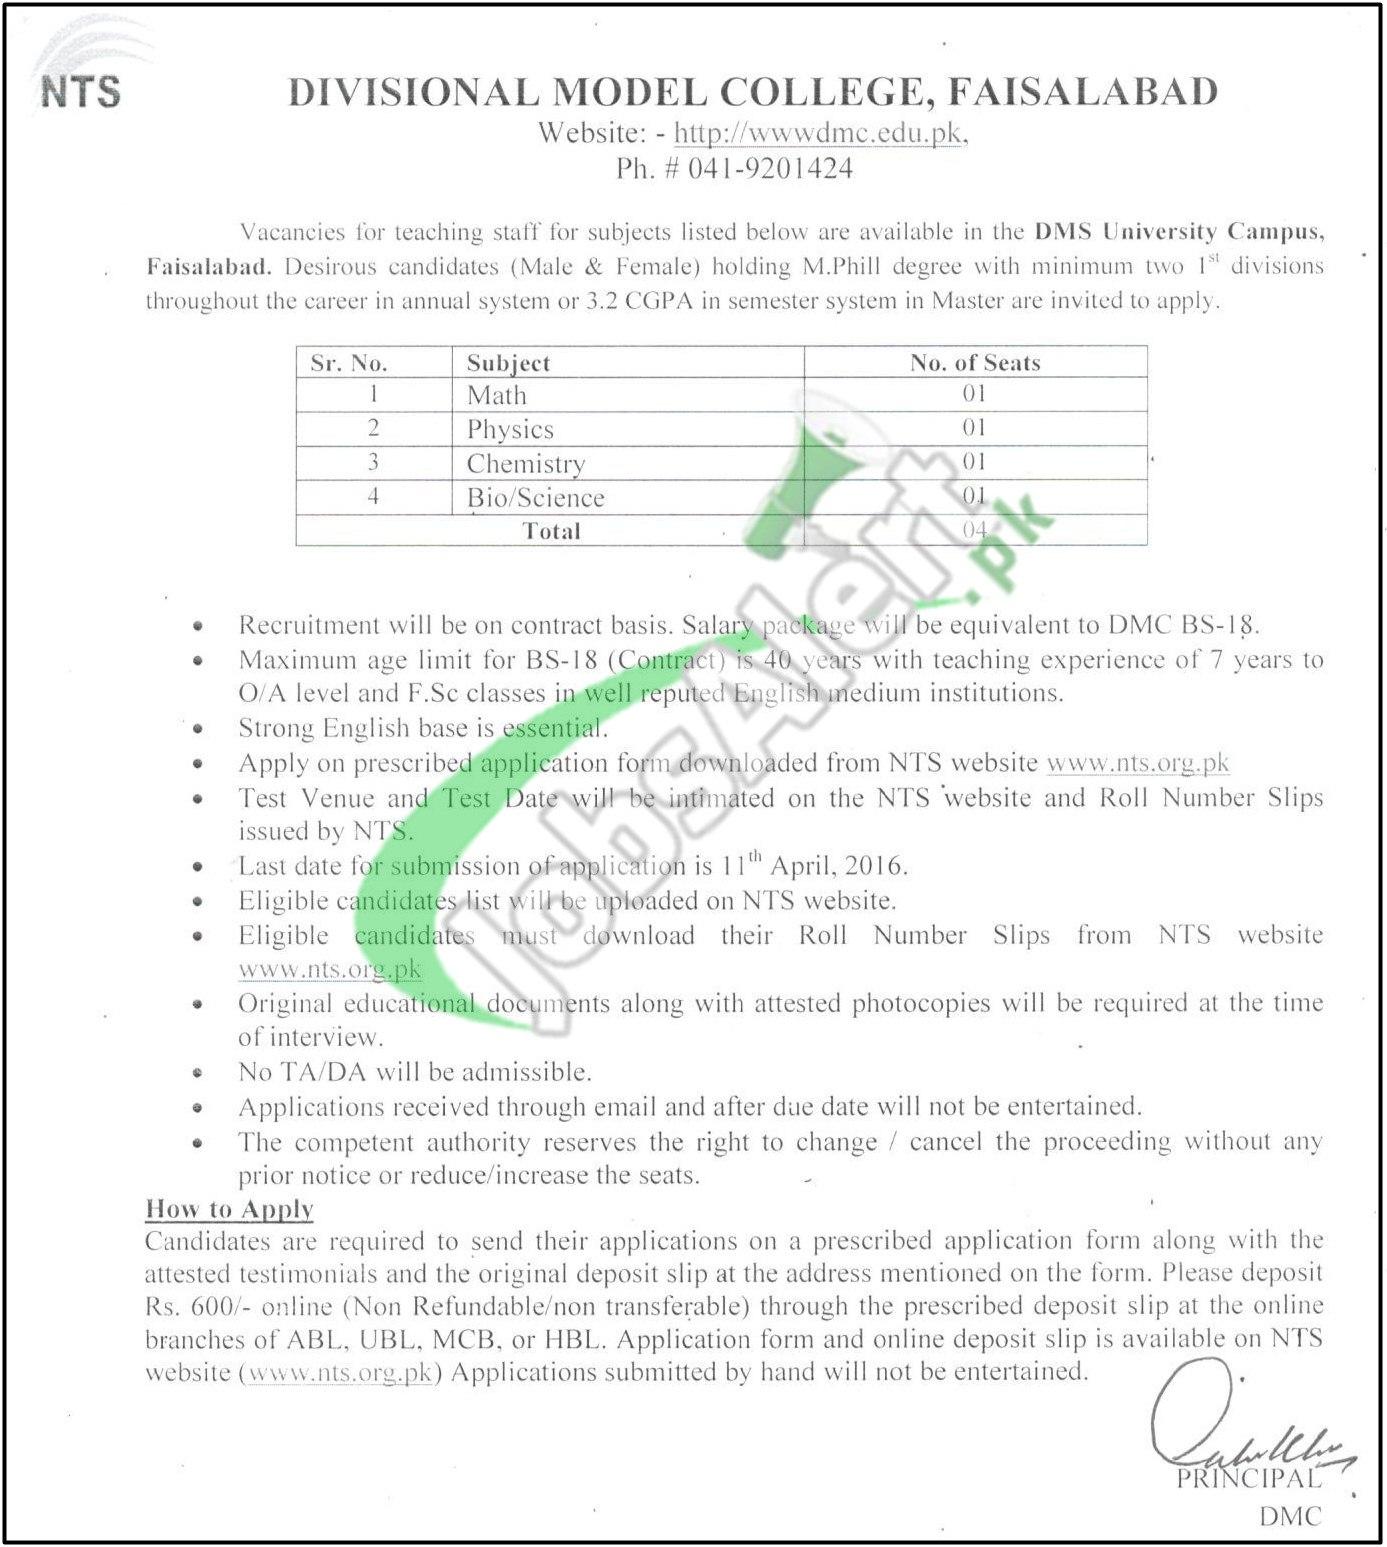 Divisional Model College Faisalabad Teacher Jobs 2016 NTS ...